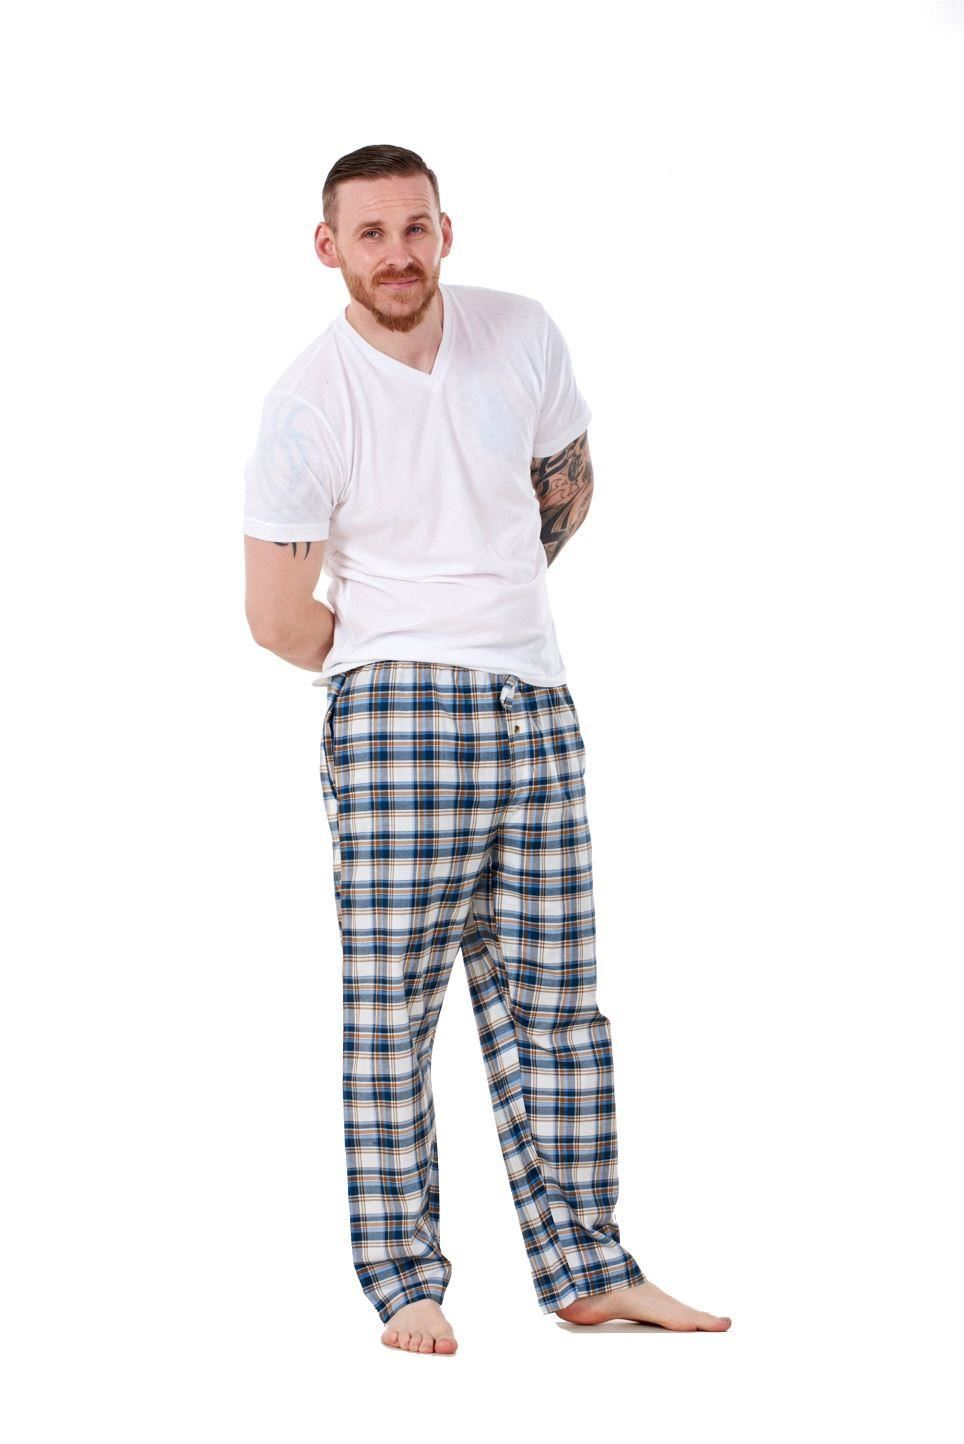 Mens-Pyjama-Bottoms-Rich-Cotton-Woven-Check-Lounge-Pant-Nightwear-Big-3XL-to-5XL Indexbild 24